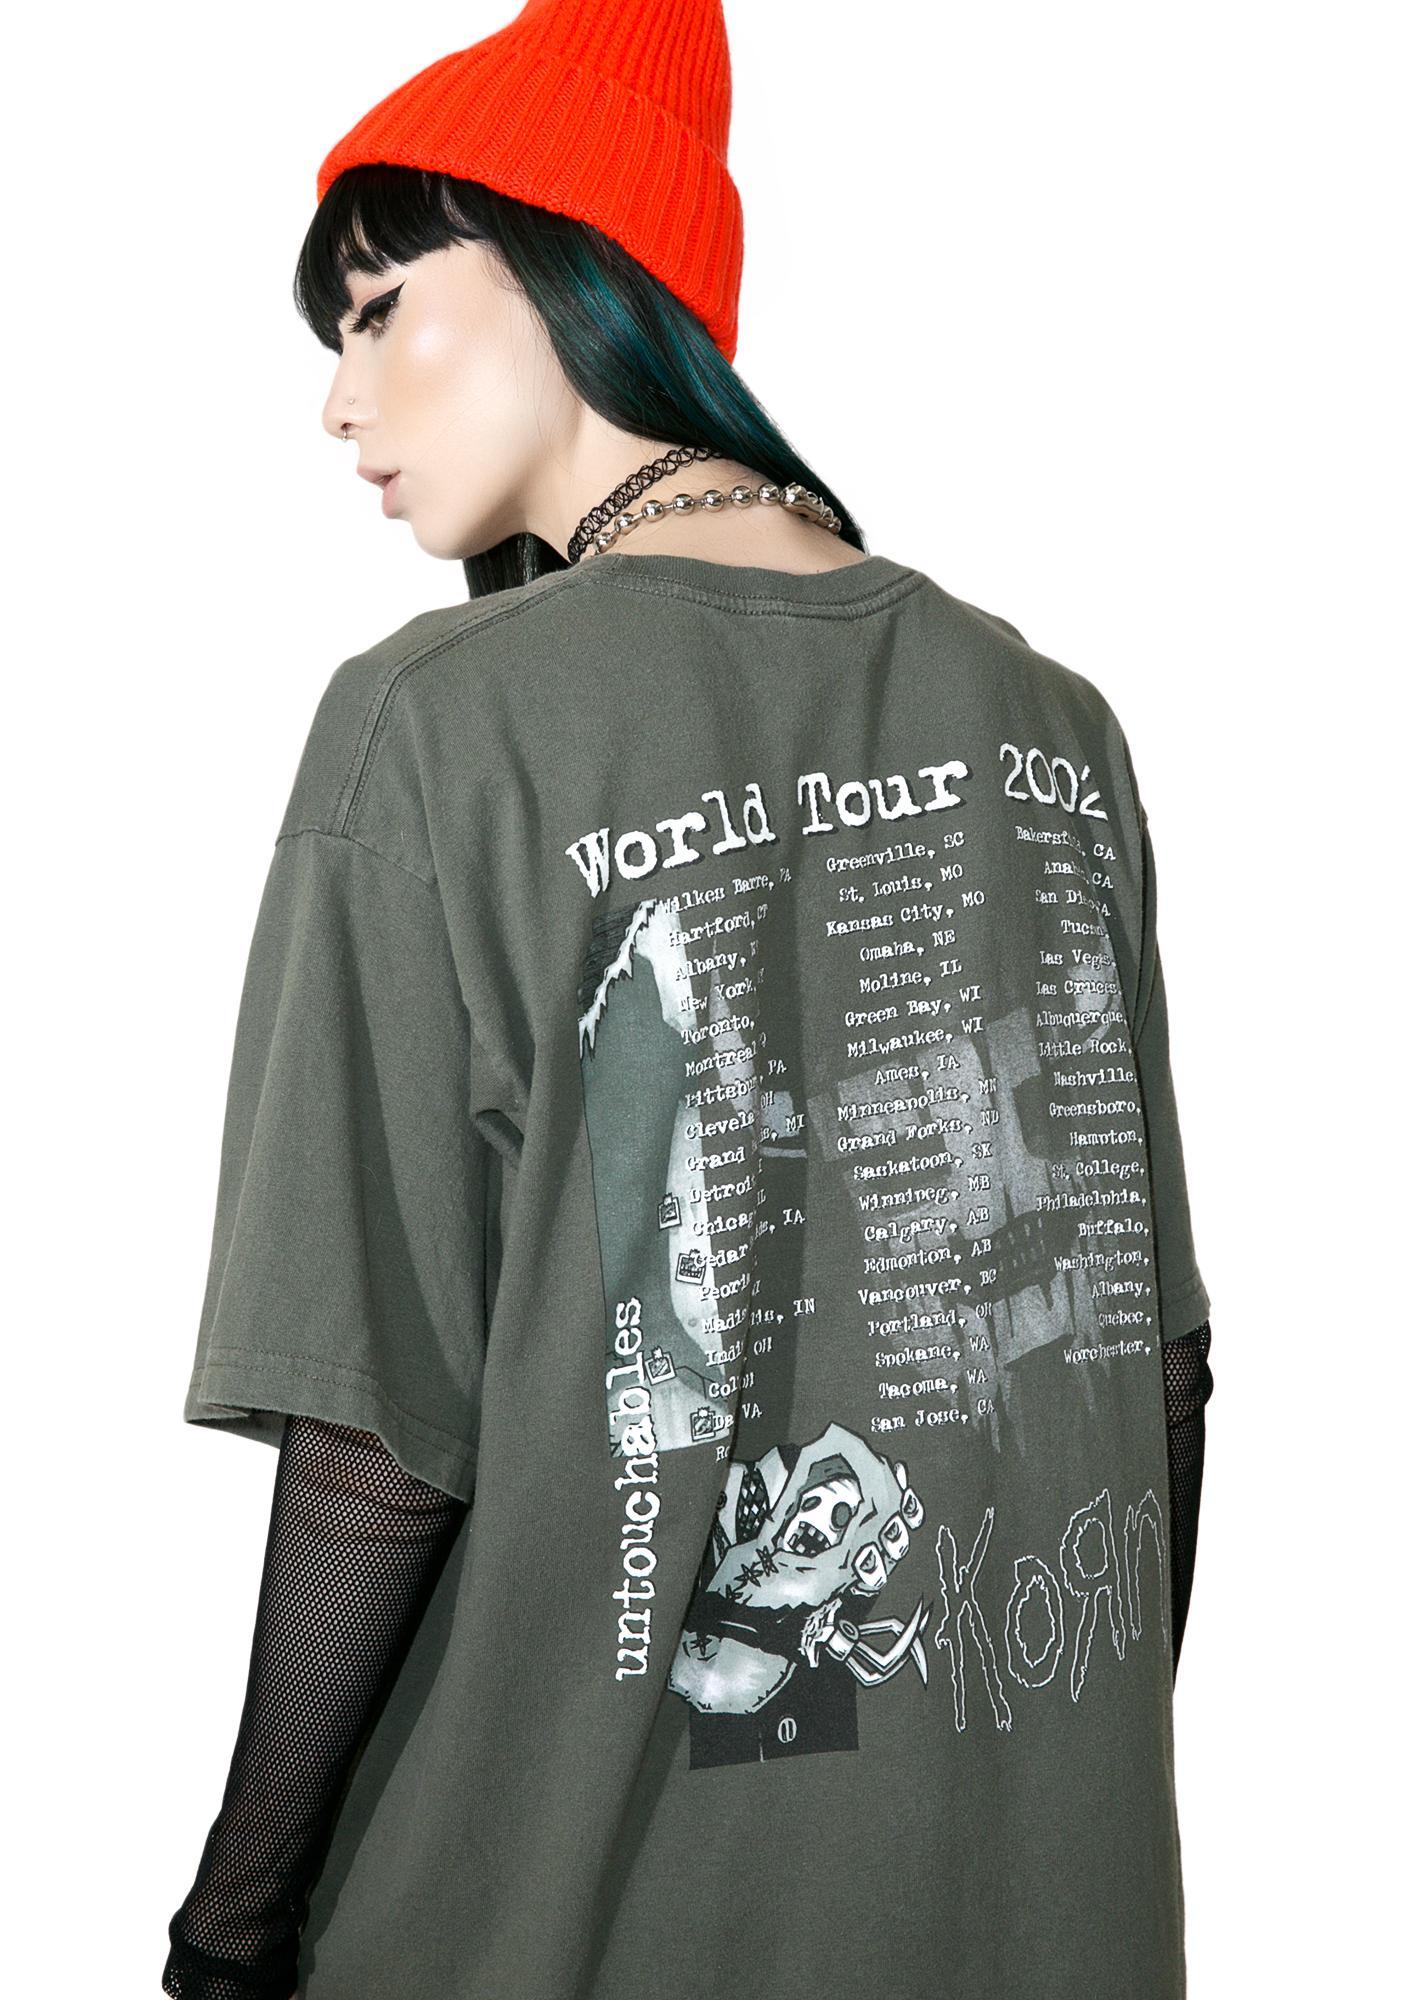 Vintage Korn '02 Tour Tee